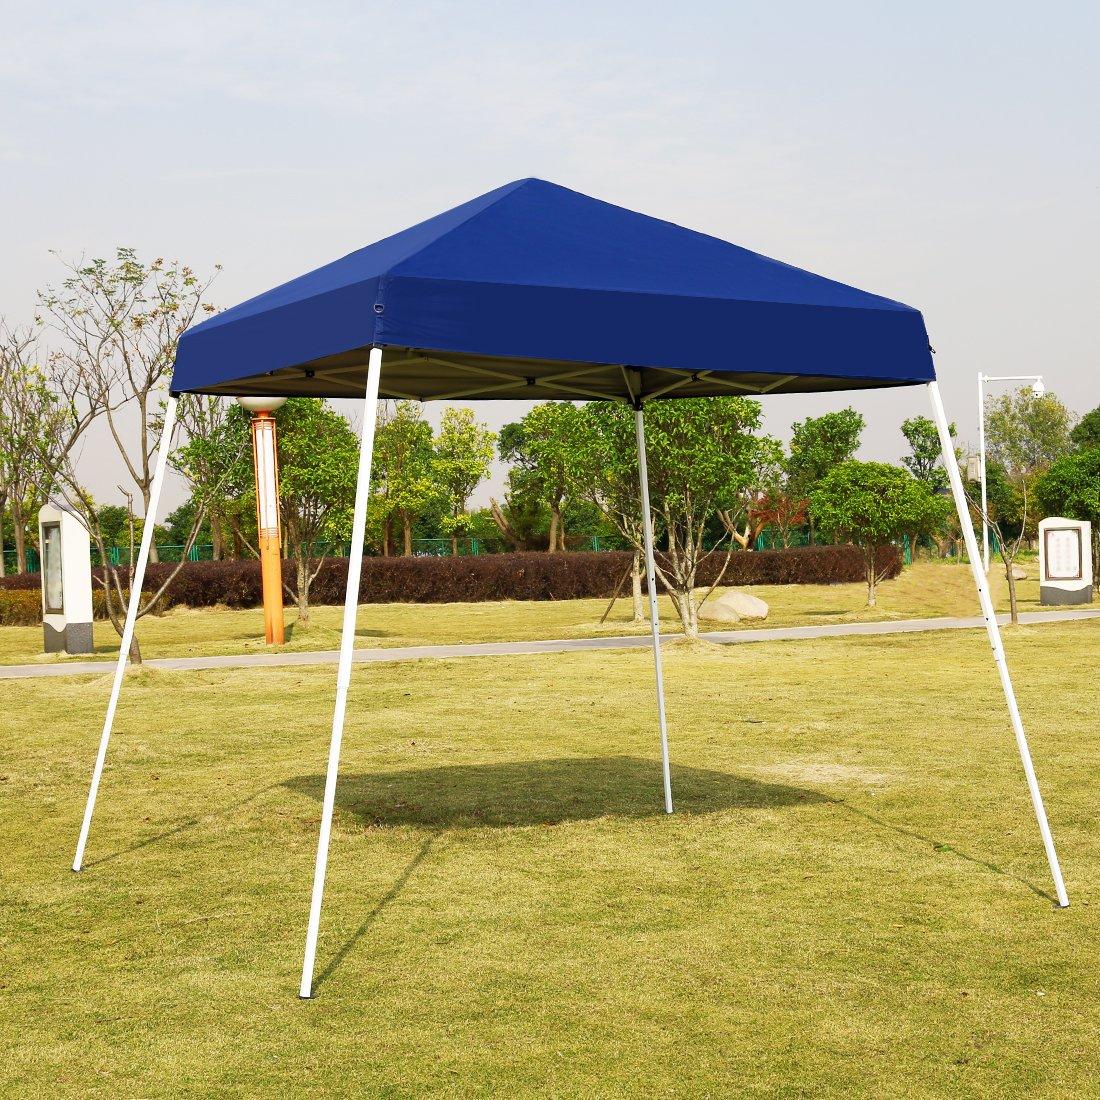 VIVOHOME Slant Leg Outdoor Easy Pop Up Canopy Party Tent Blue 10 x 10 ft